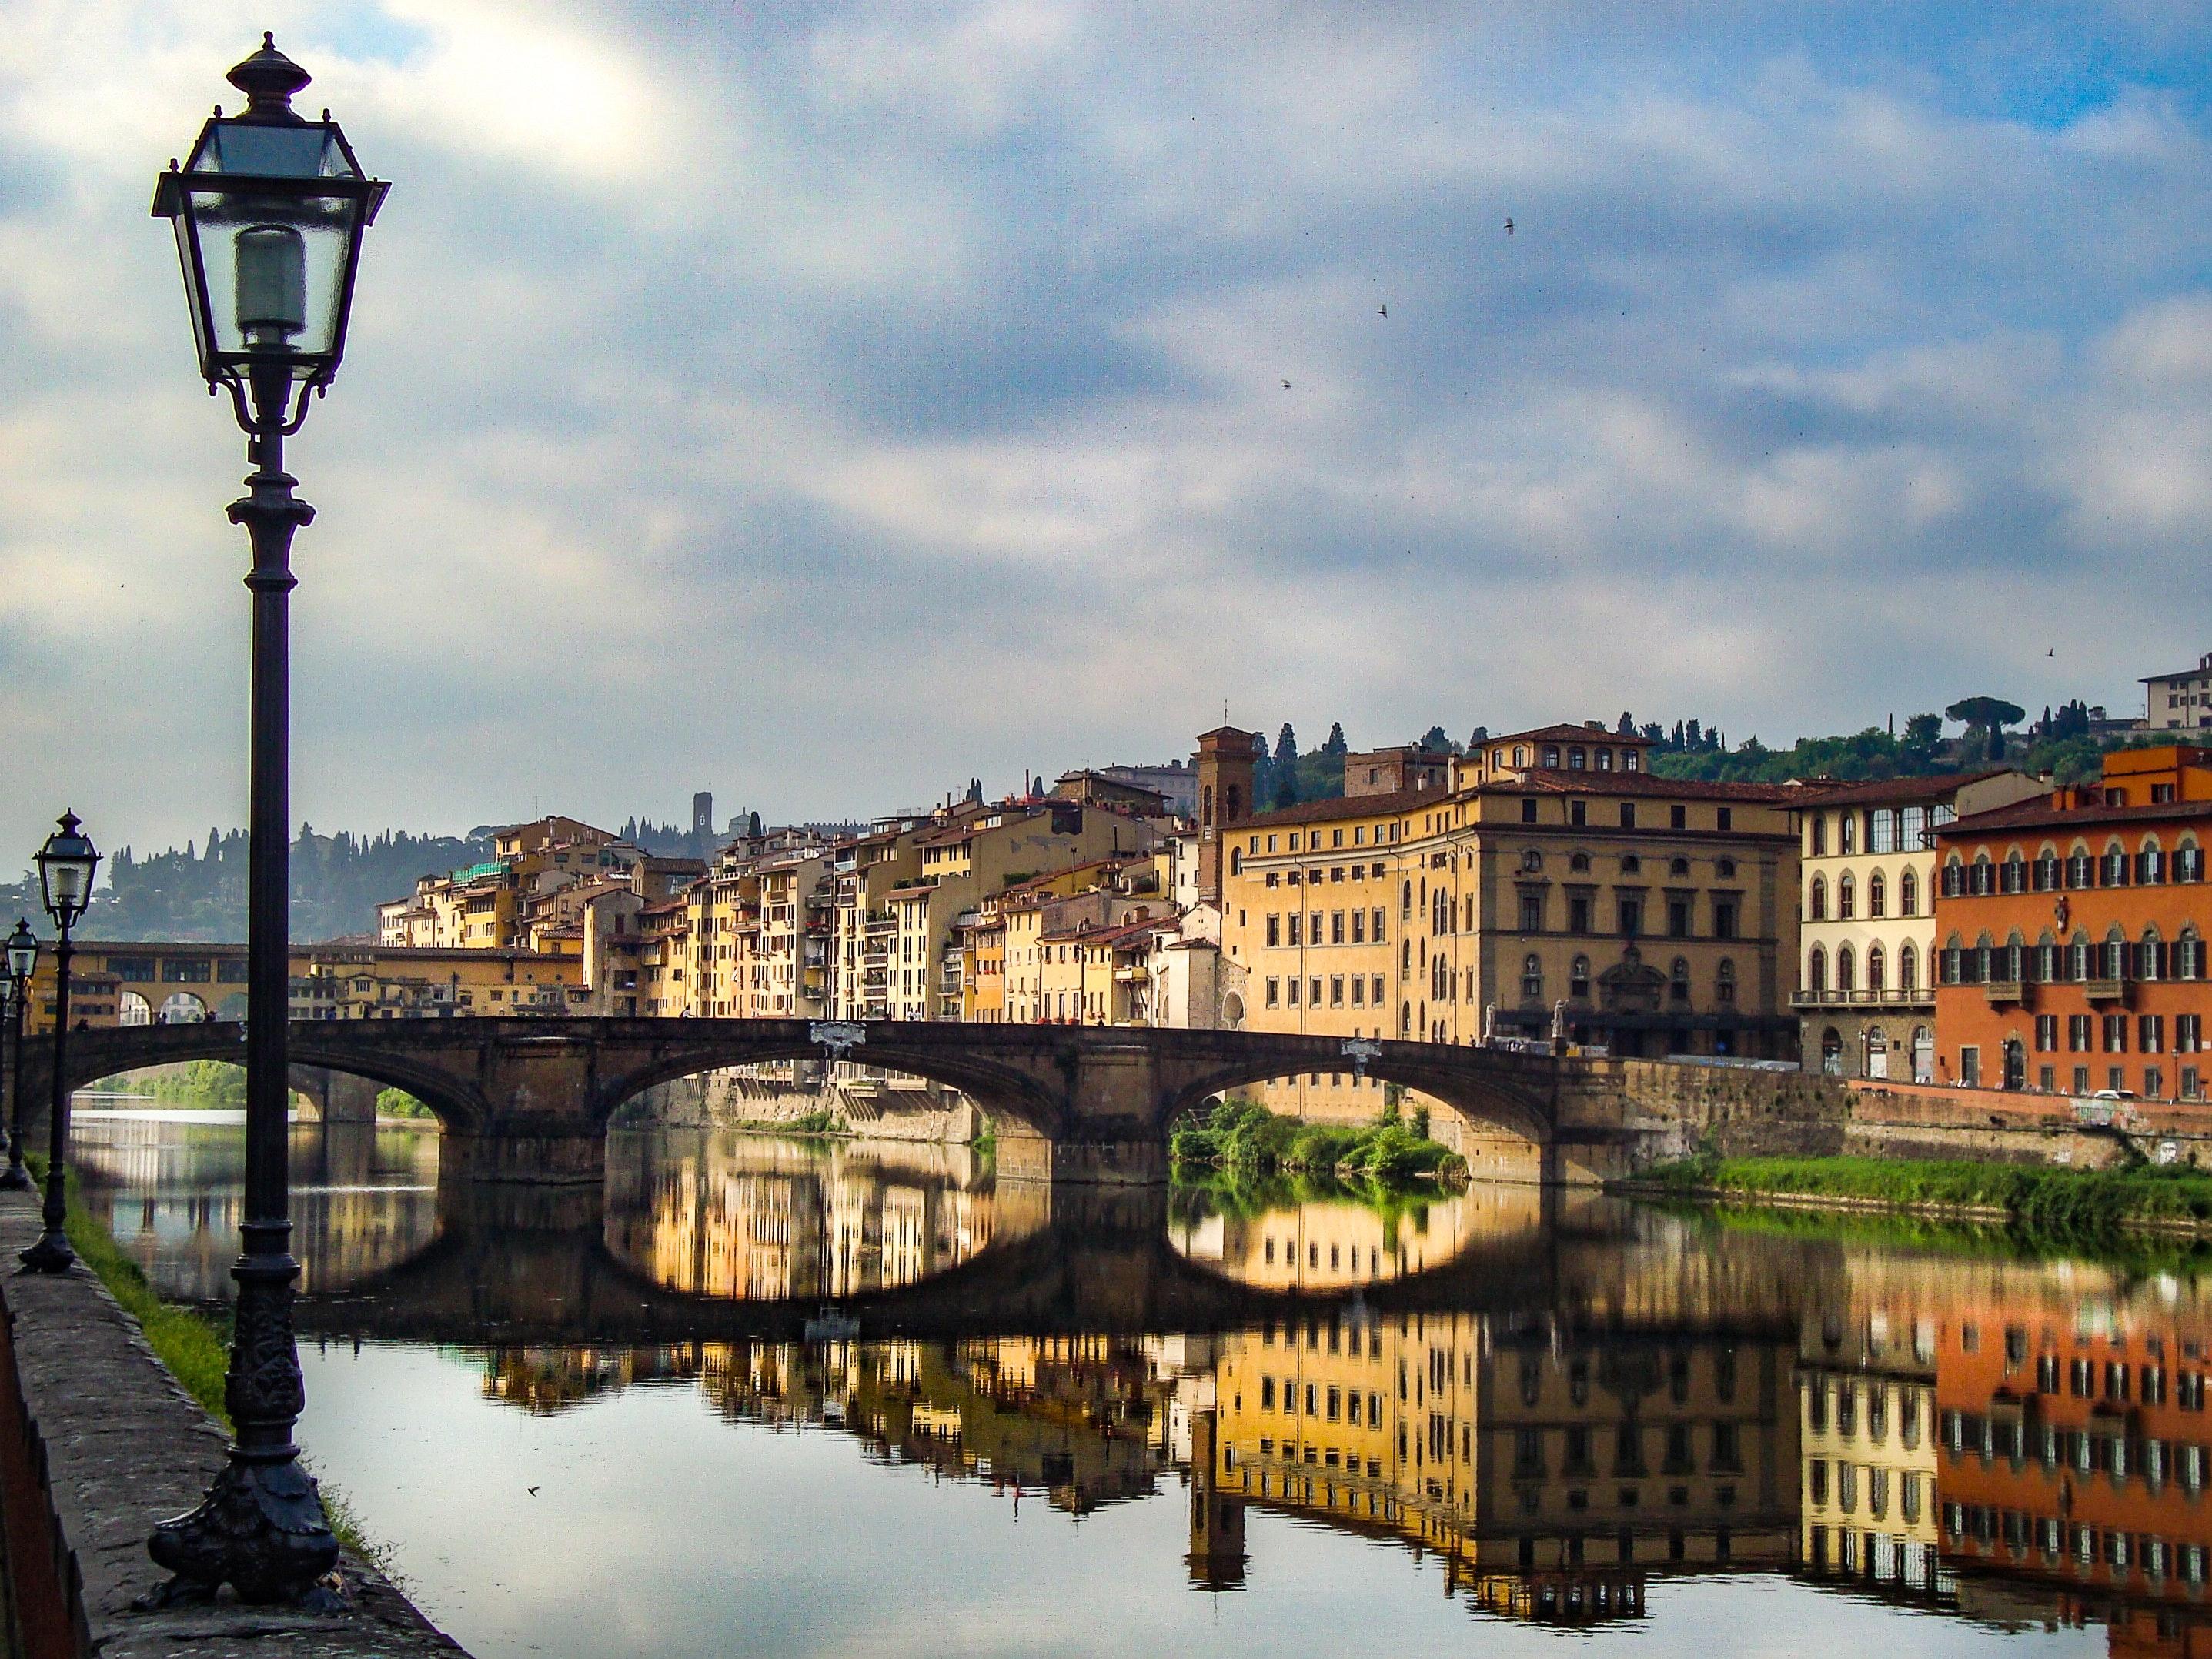 trekbible, travel, train, GoEuro, visit Europe, visit Italy, Italy, train travel, fall travel autumn travel, travel inspiration